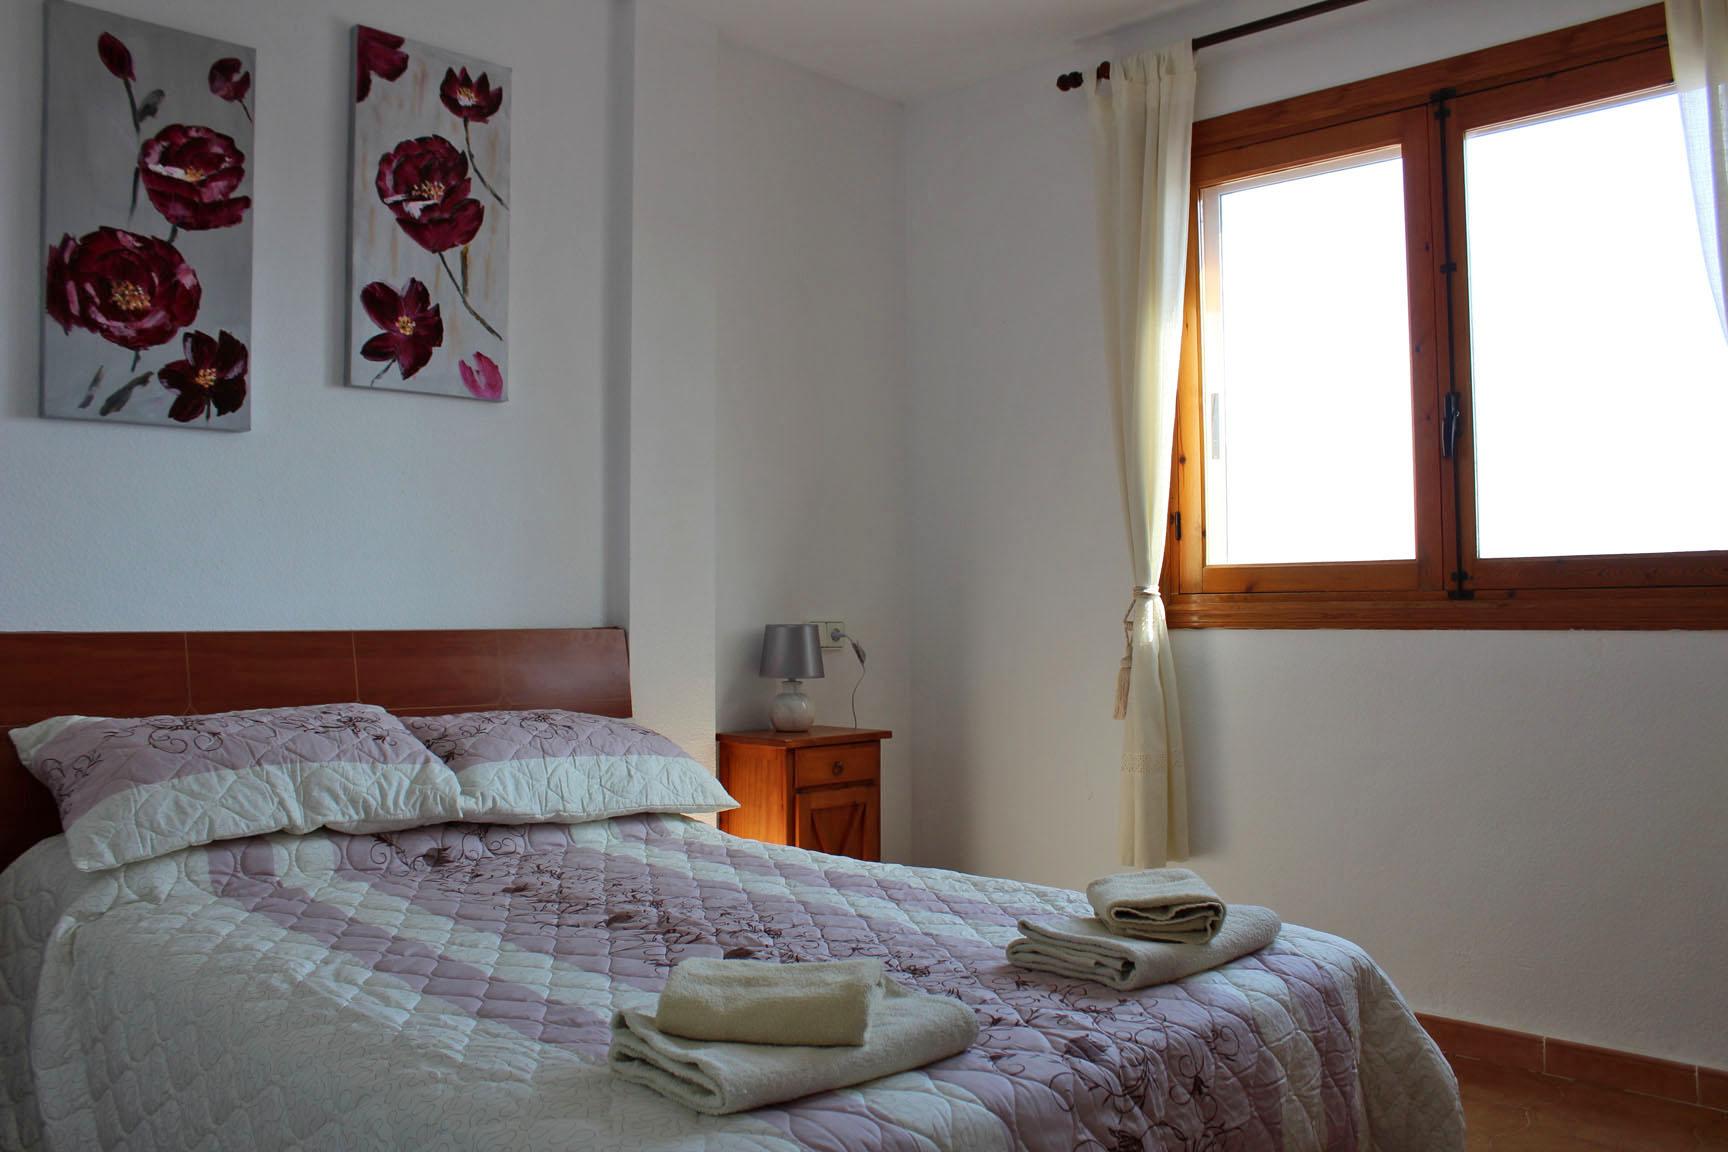 ITSH Property Double bedroom 9